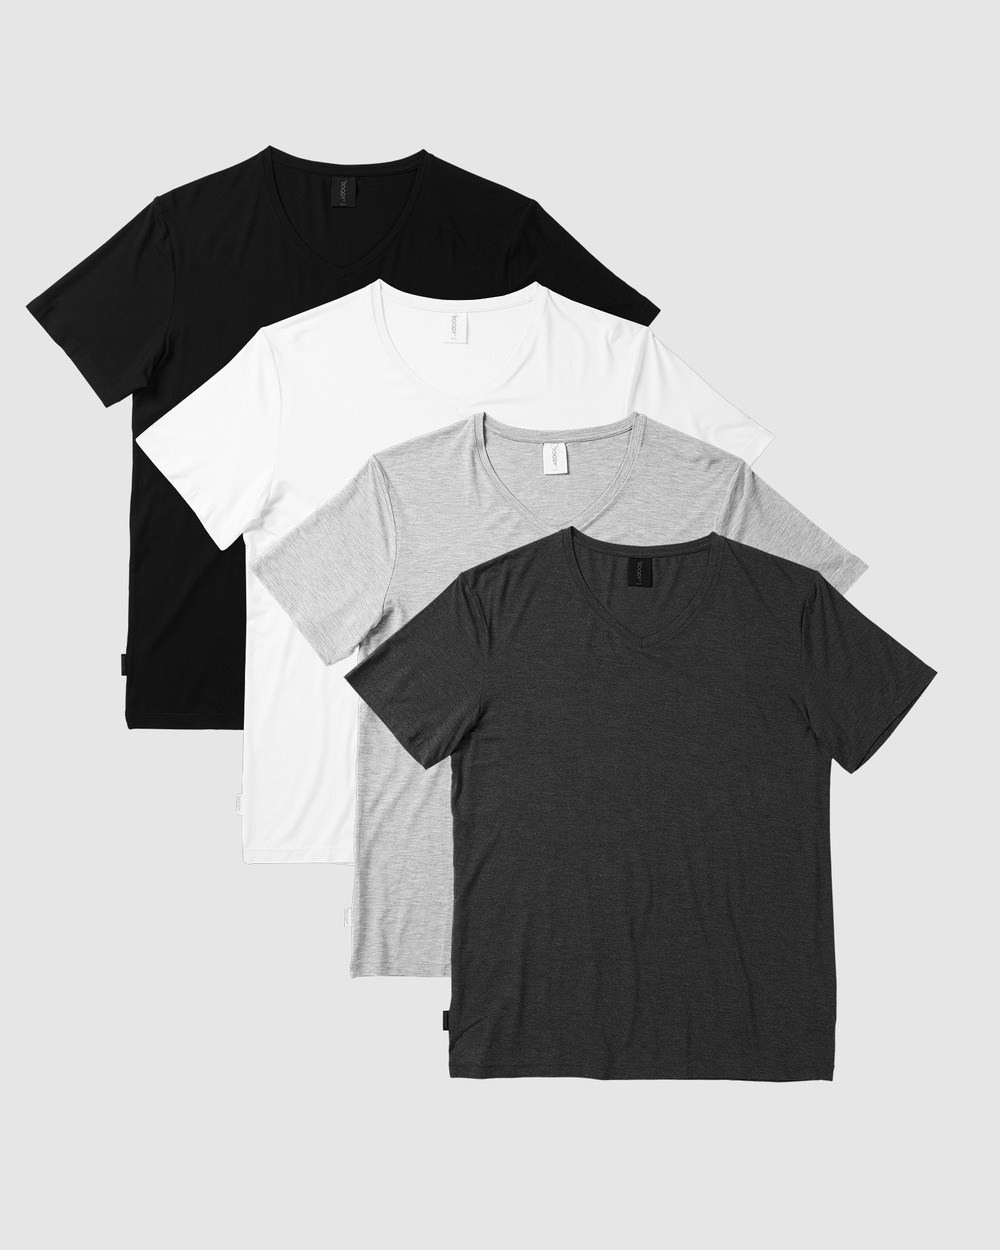 Boody Organic Bamboo Eco Wear - 4 Pack V Neck T Shirt - Short Sleeve T-Shirts (Multi) 4 Pack V-Neck T-Shirt